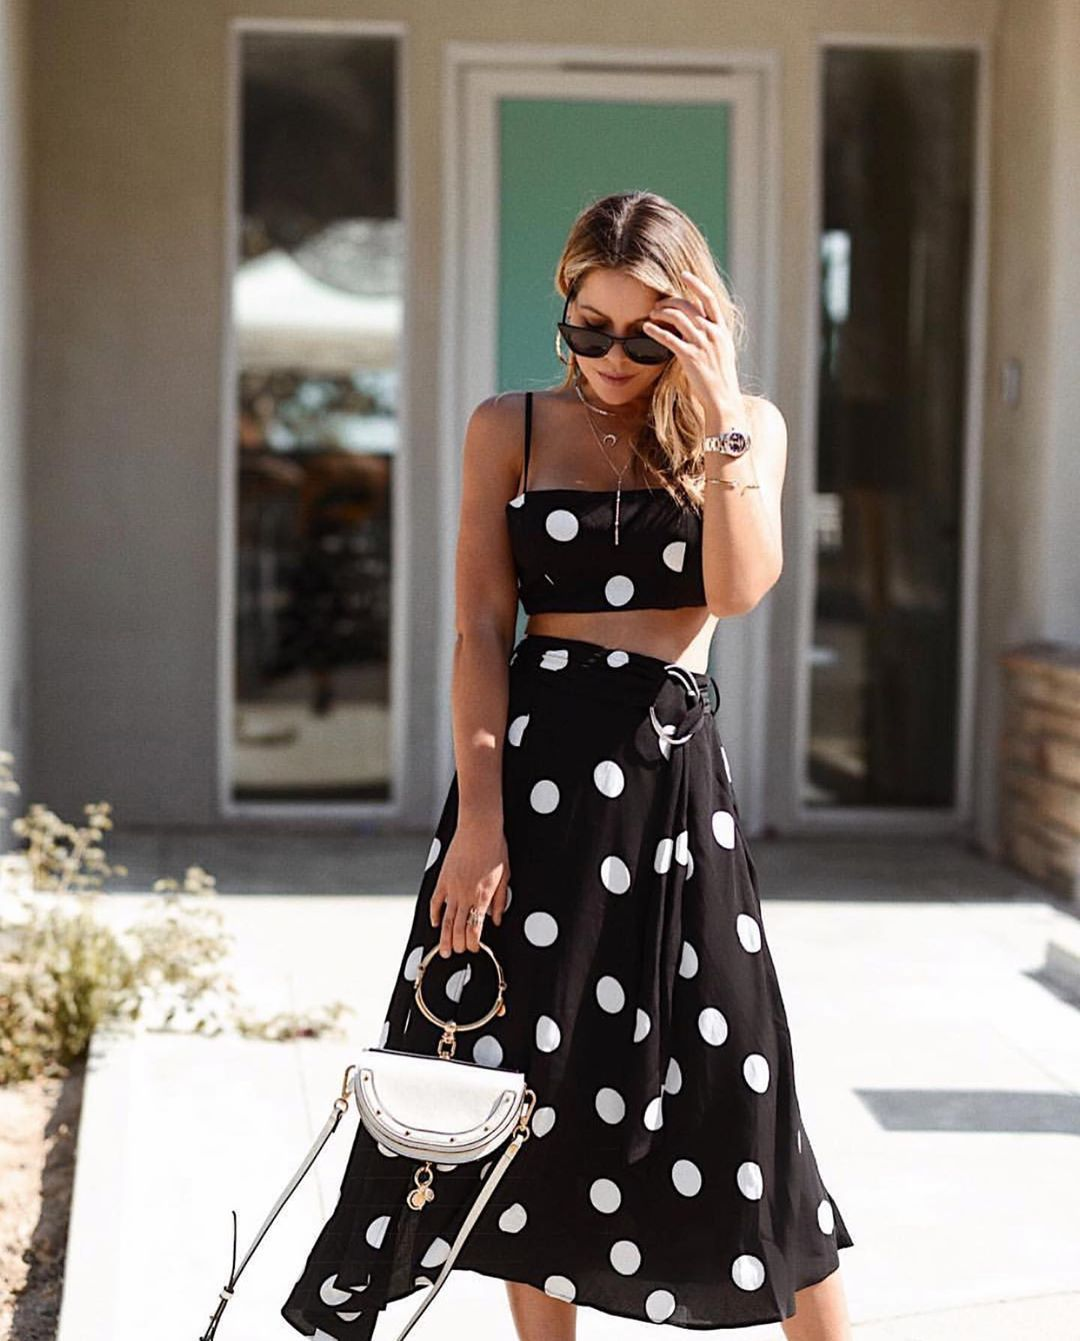 skirt midi skirt black skirt polka dots wrap skirt black top crop tops handbag